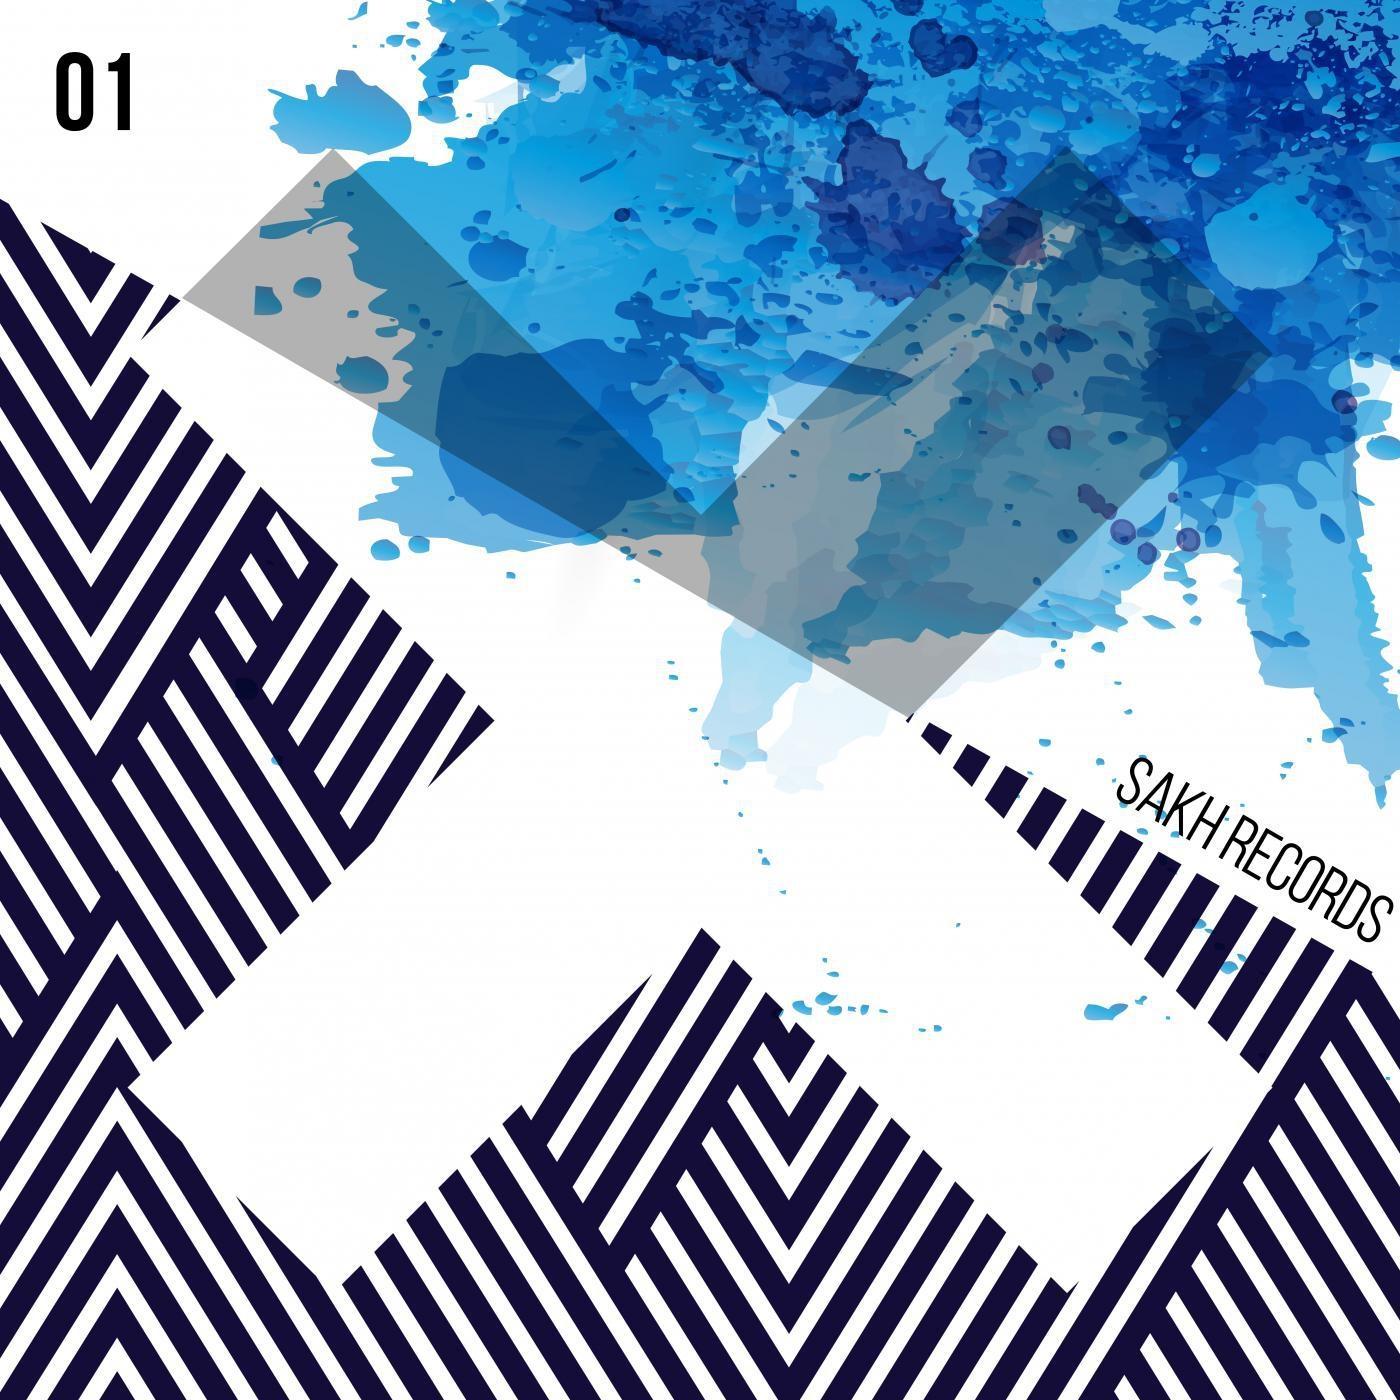 Schneider Electric - Away (Dreaman Remix)